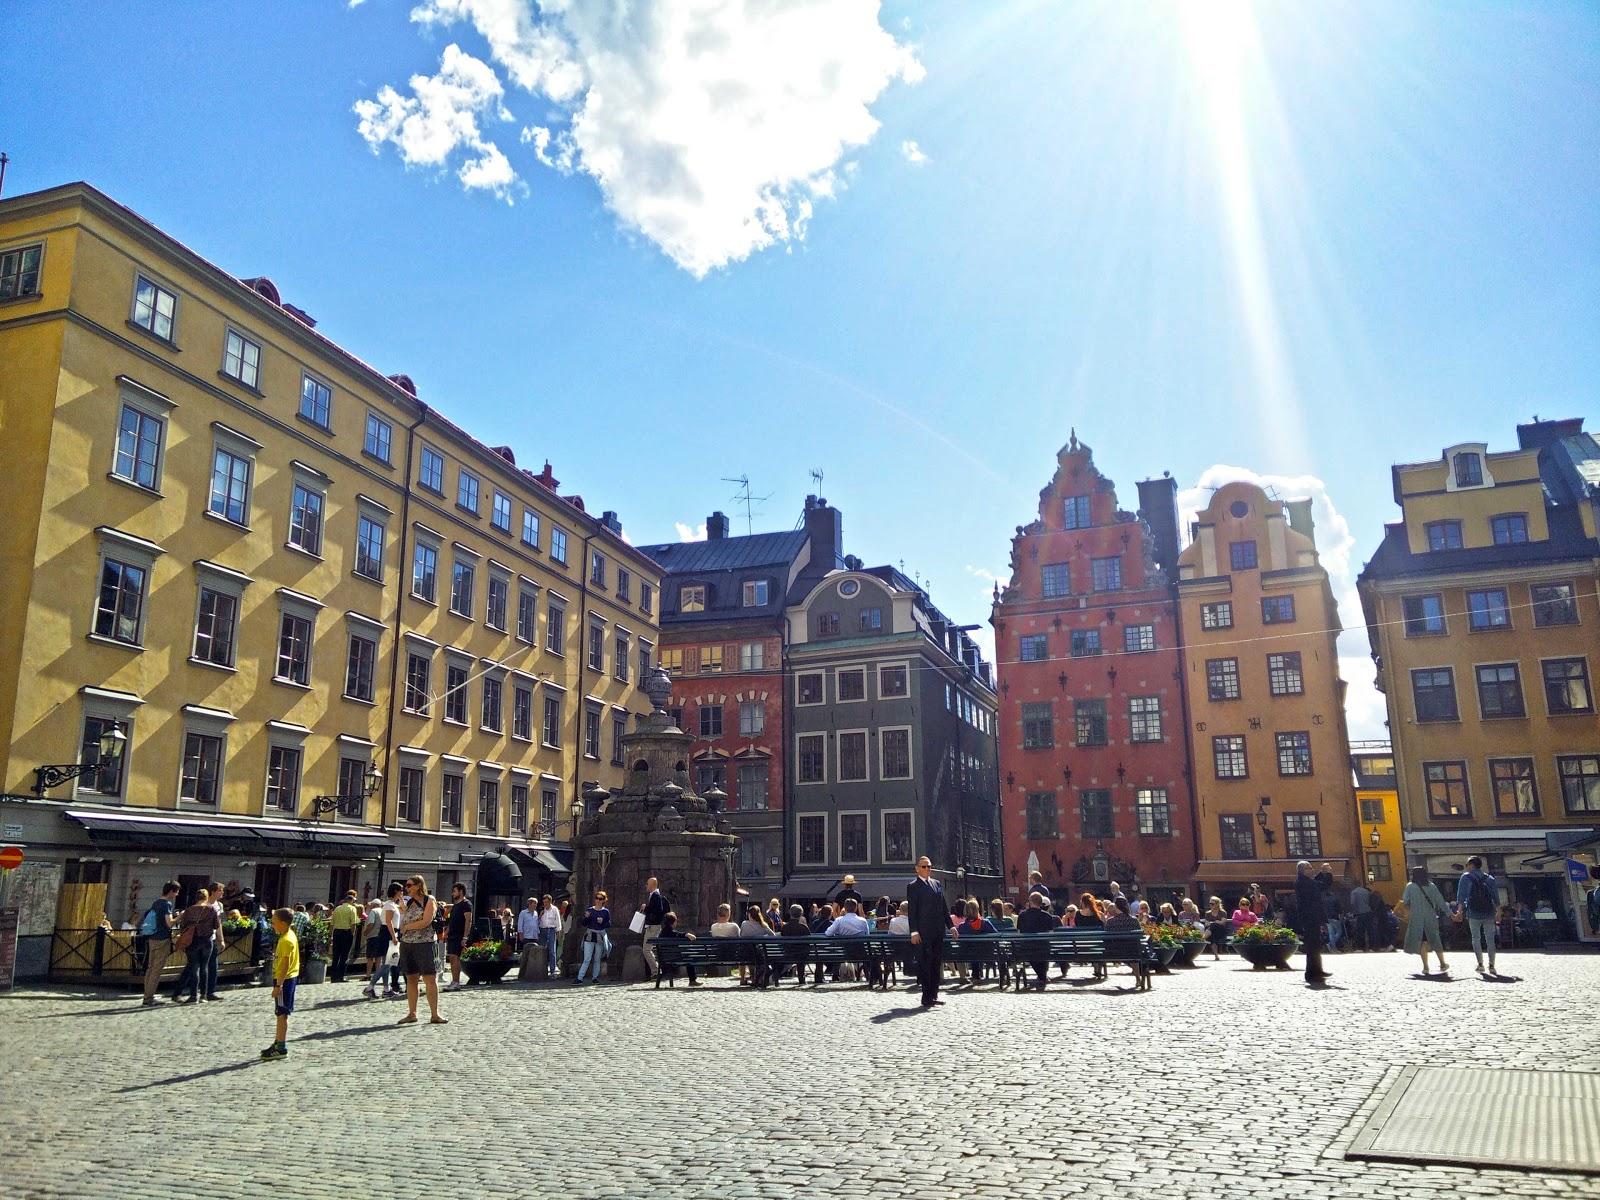 Square at Gamla Stan, Stockholm